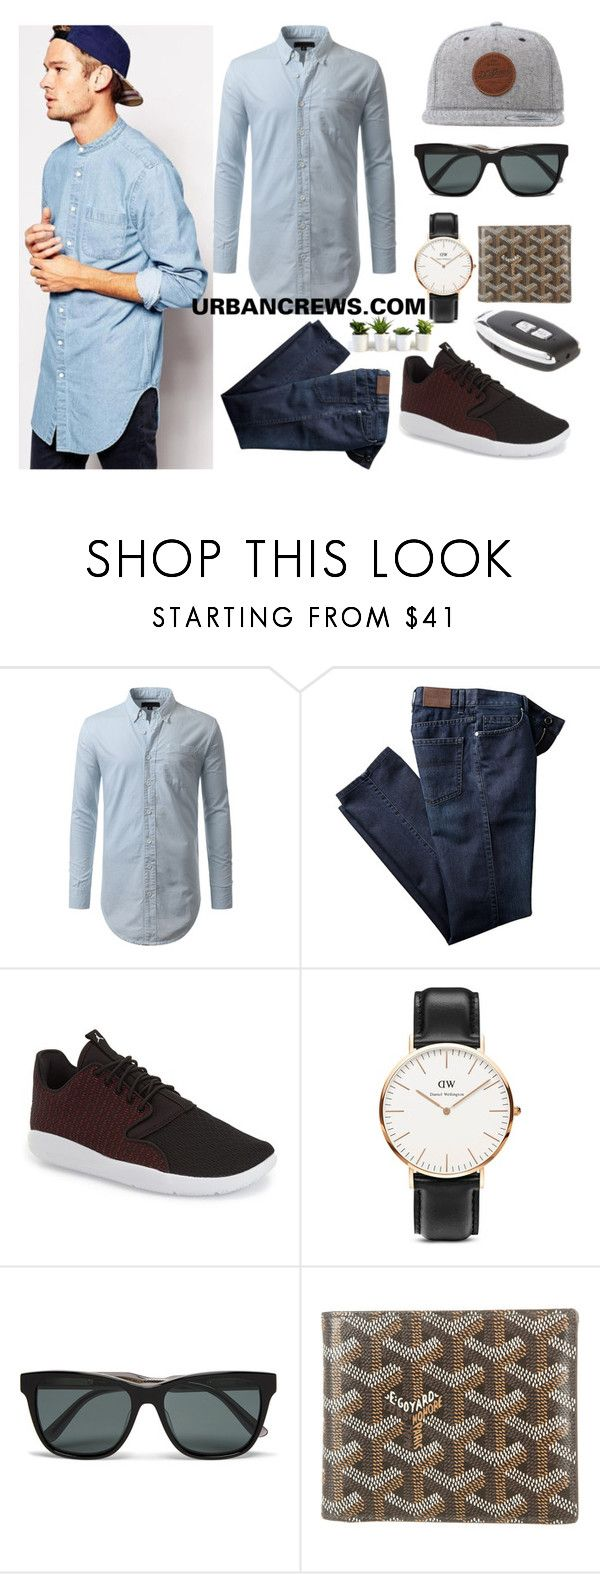 """URBANCREWS Mens Longline Denim Shirt Outfit"" by urbancleo ❤ liked on Polyvore featuring ASOS, DC Shoes, NIKE, Daniel Wellington, Bottega Veneta, Goyard, men's fashion and menswear"